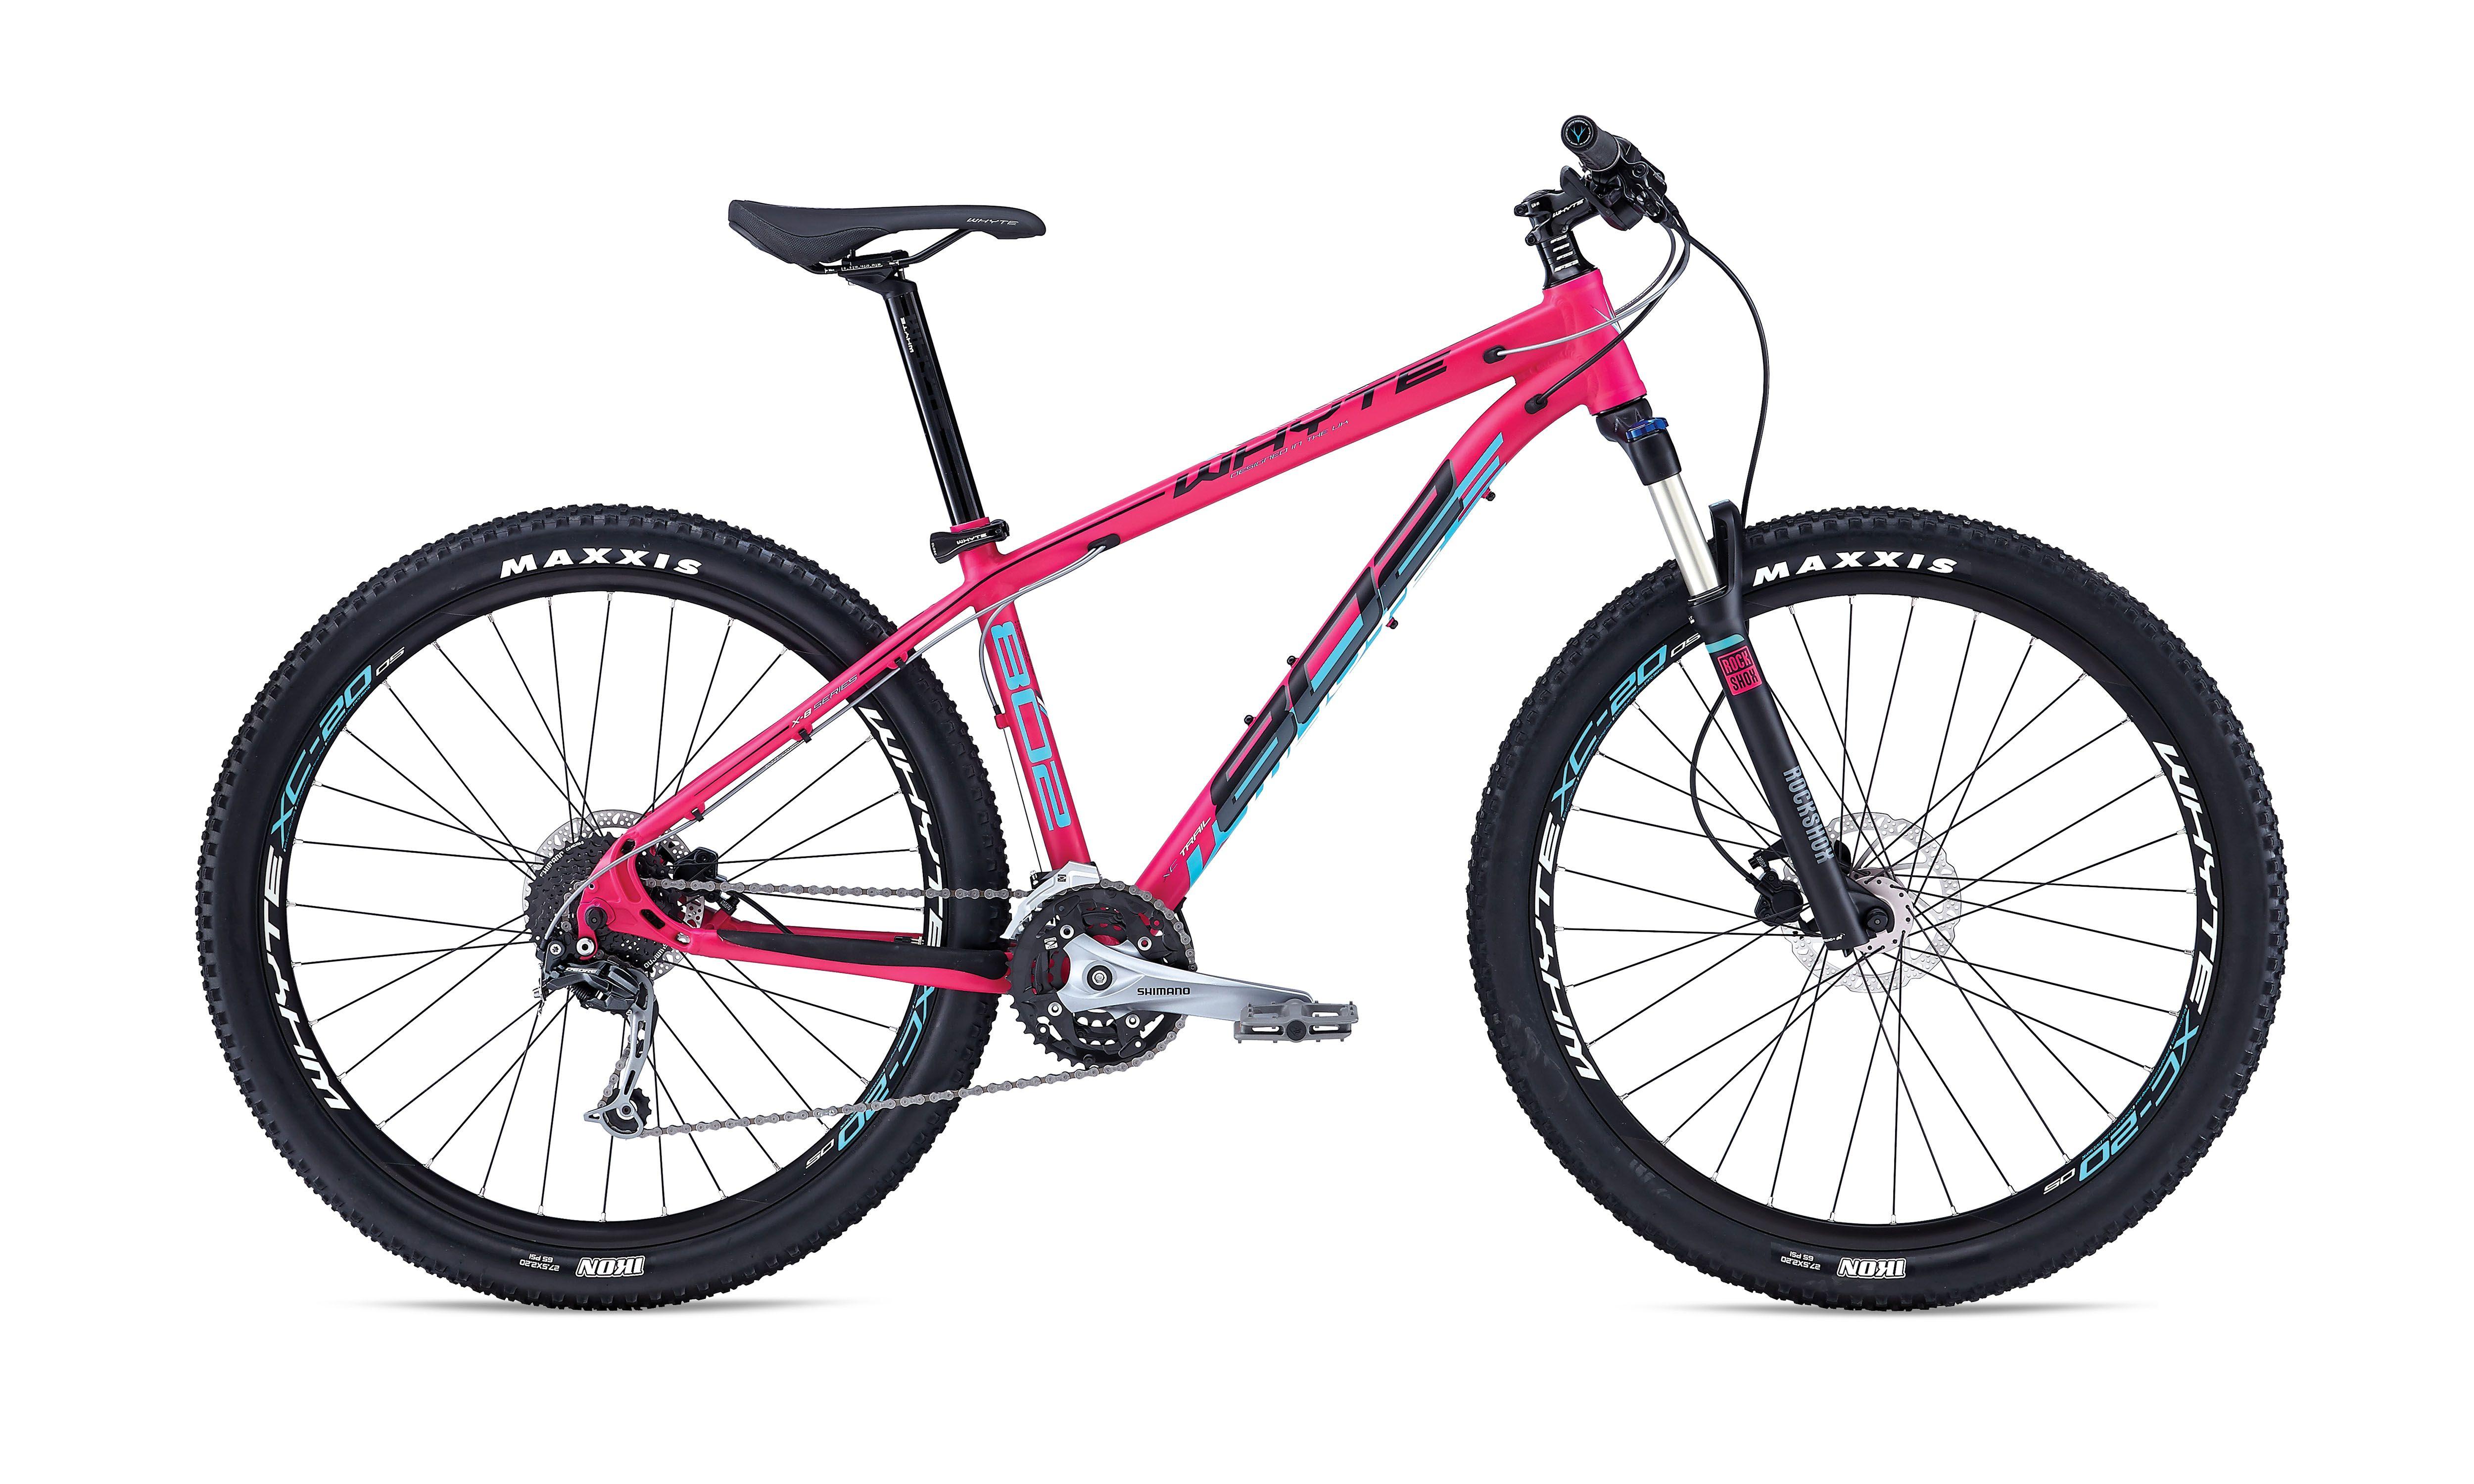 2016 Whyte 802 Womens 650b Hardtail Mountain Bike Pink